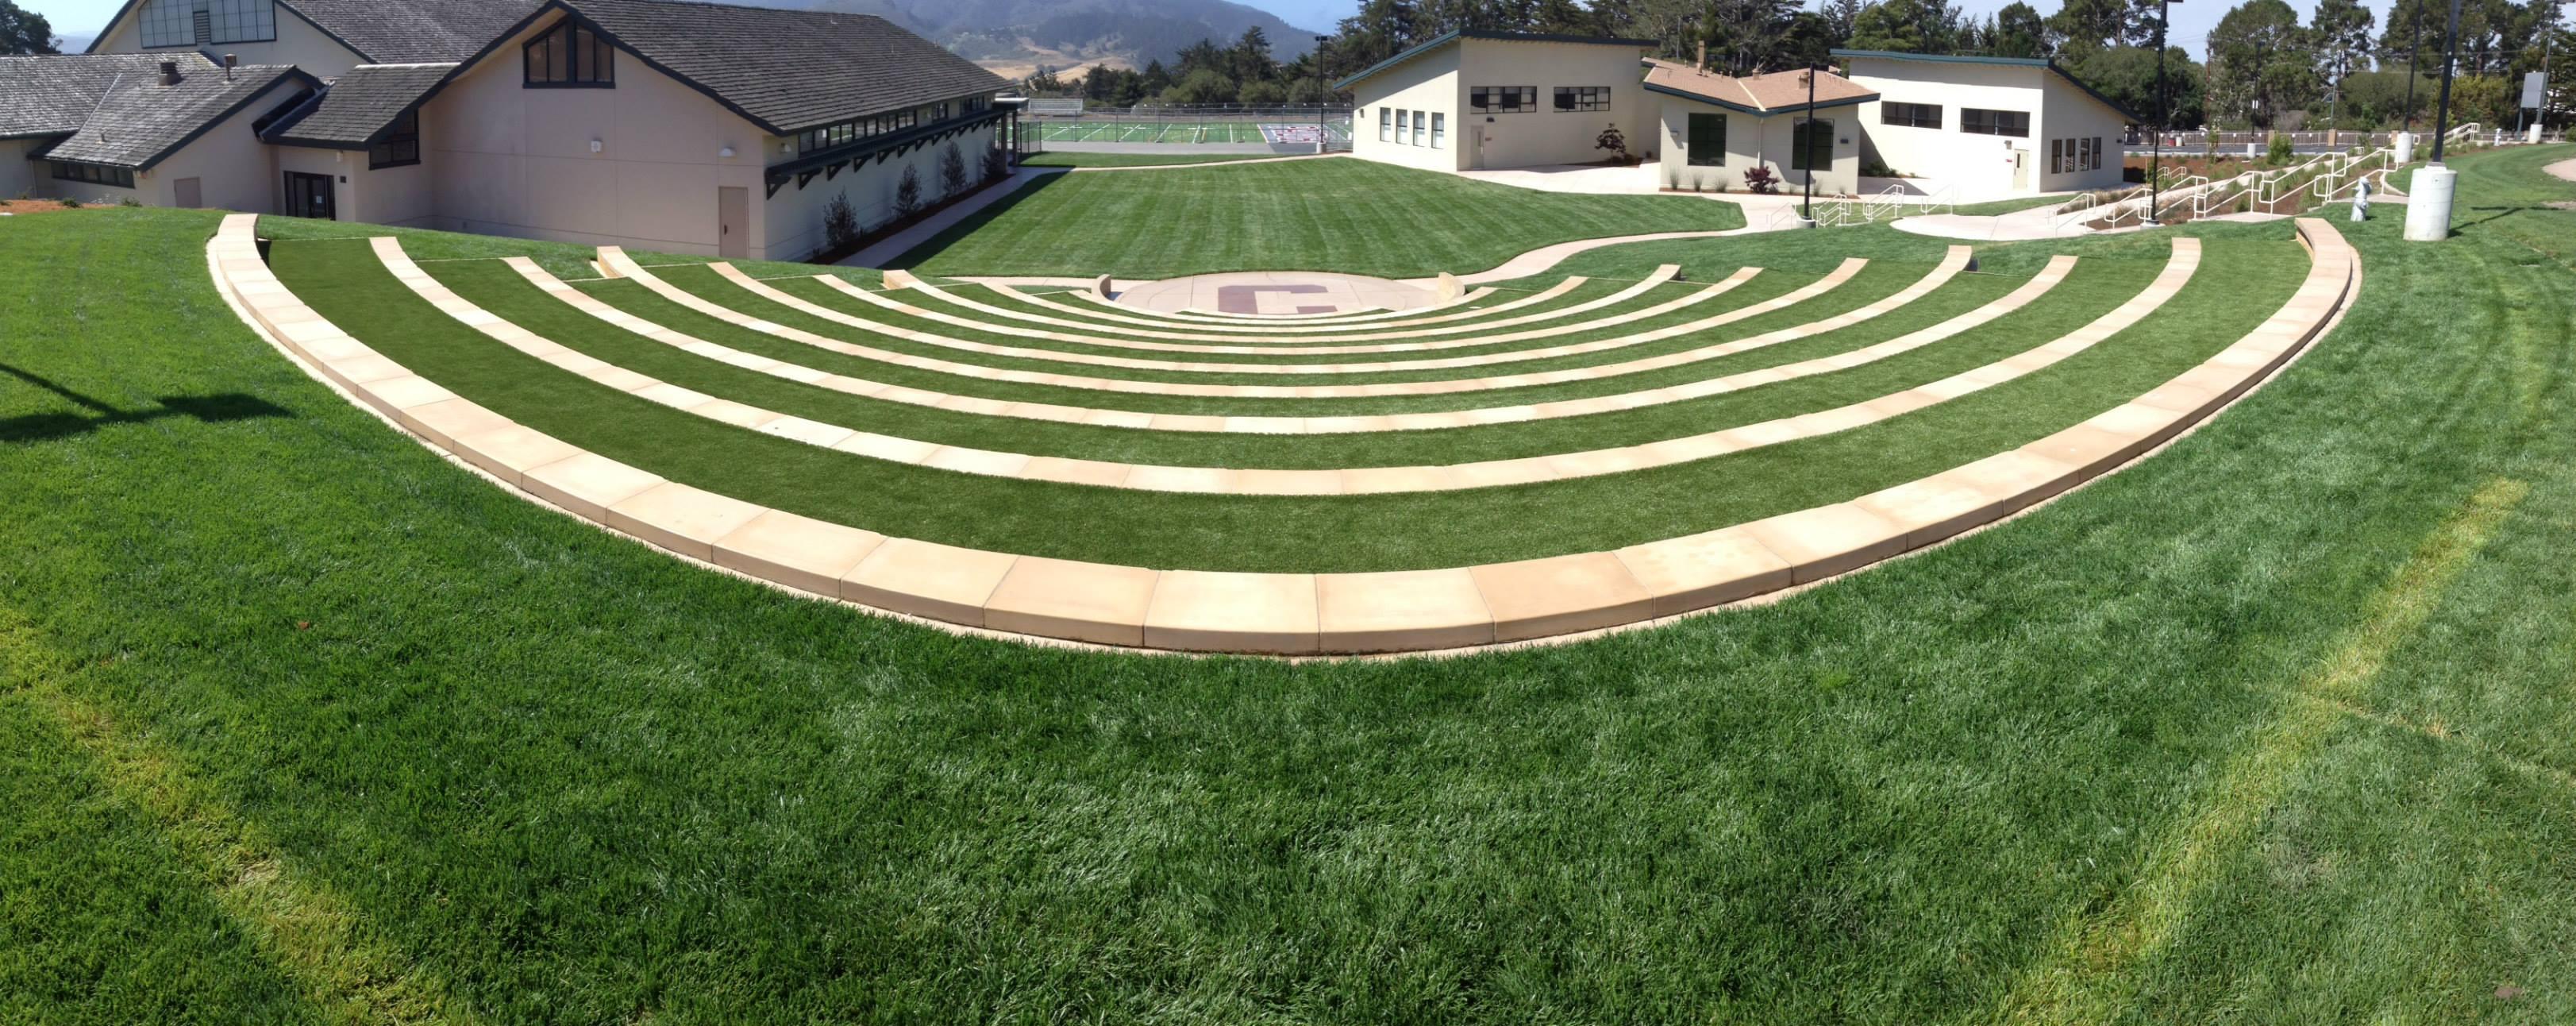 Carmel High School Amphitheatre - Xtreme Green Synthetic Turf